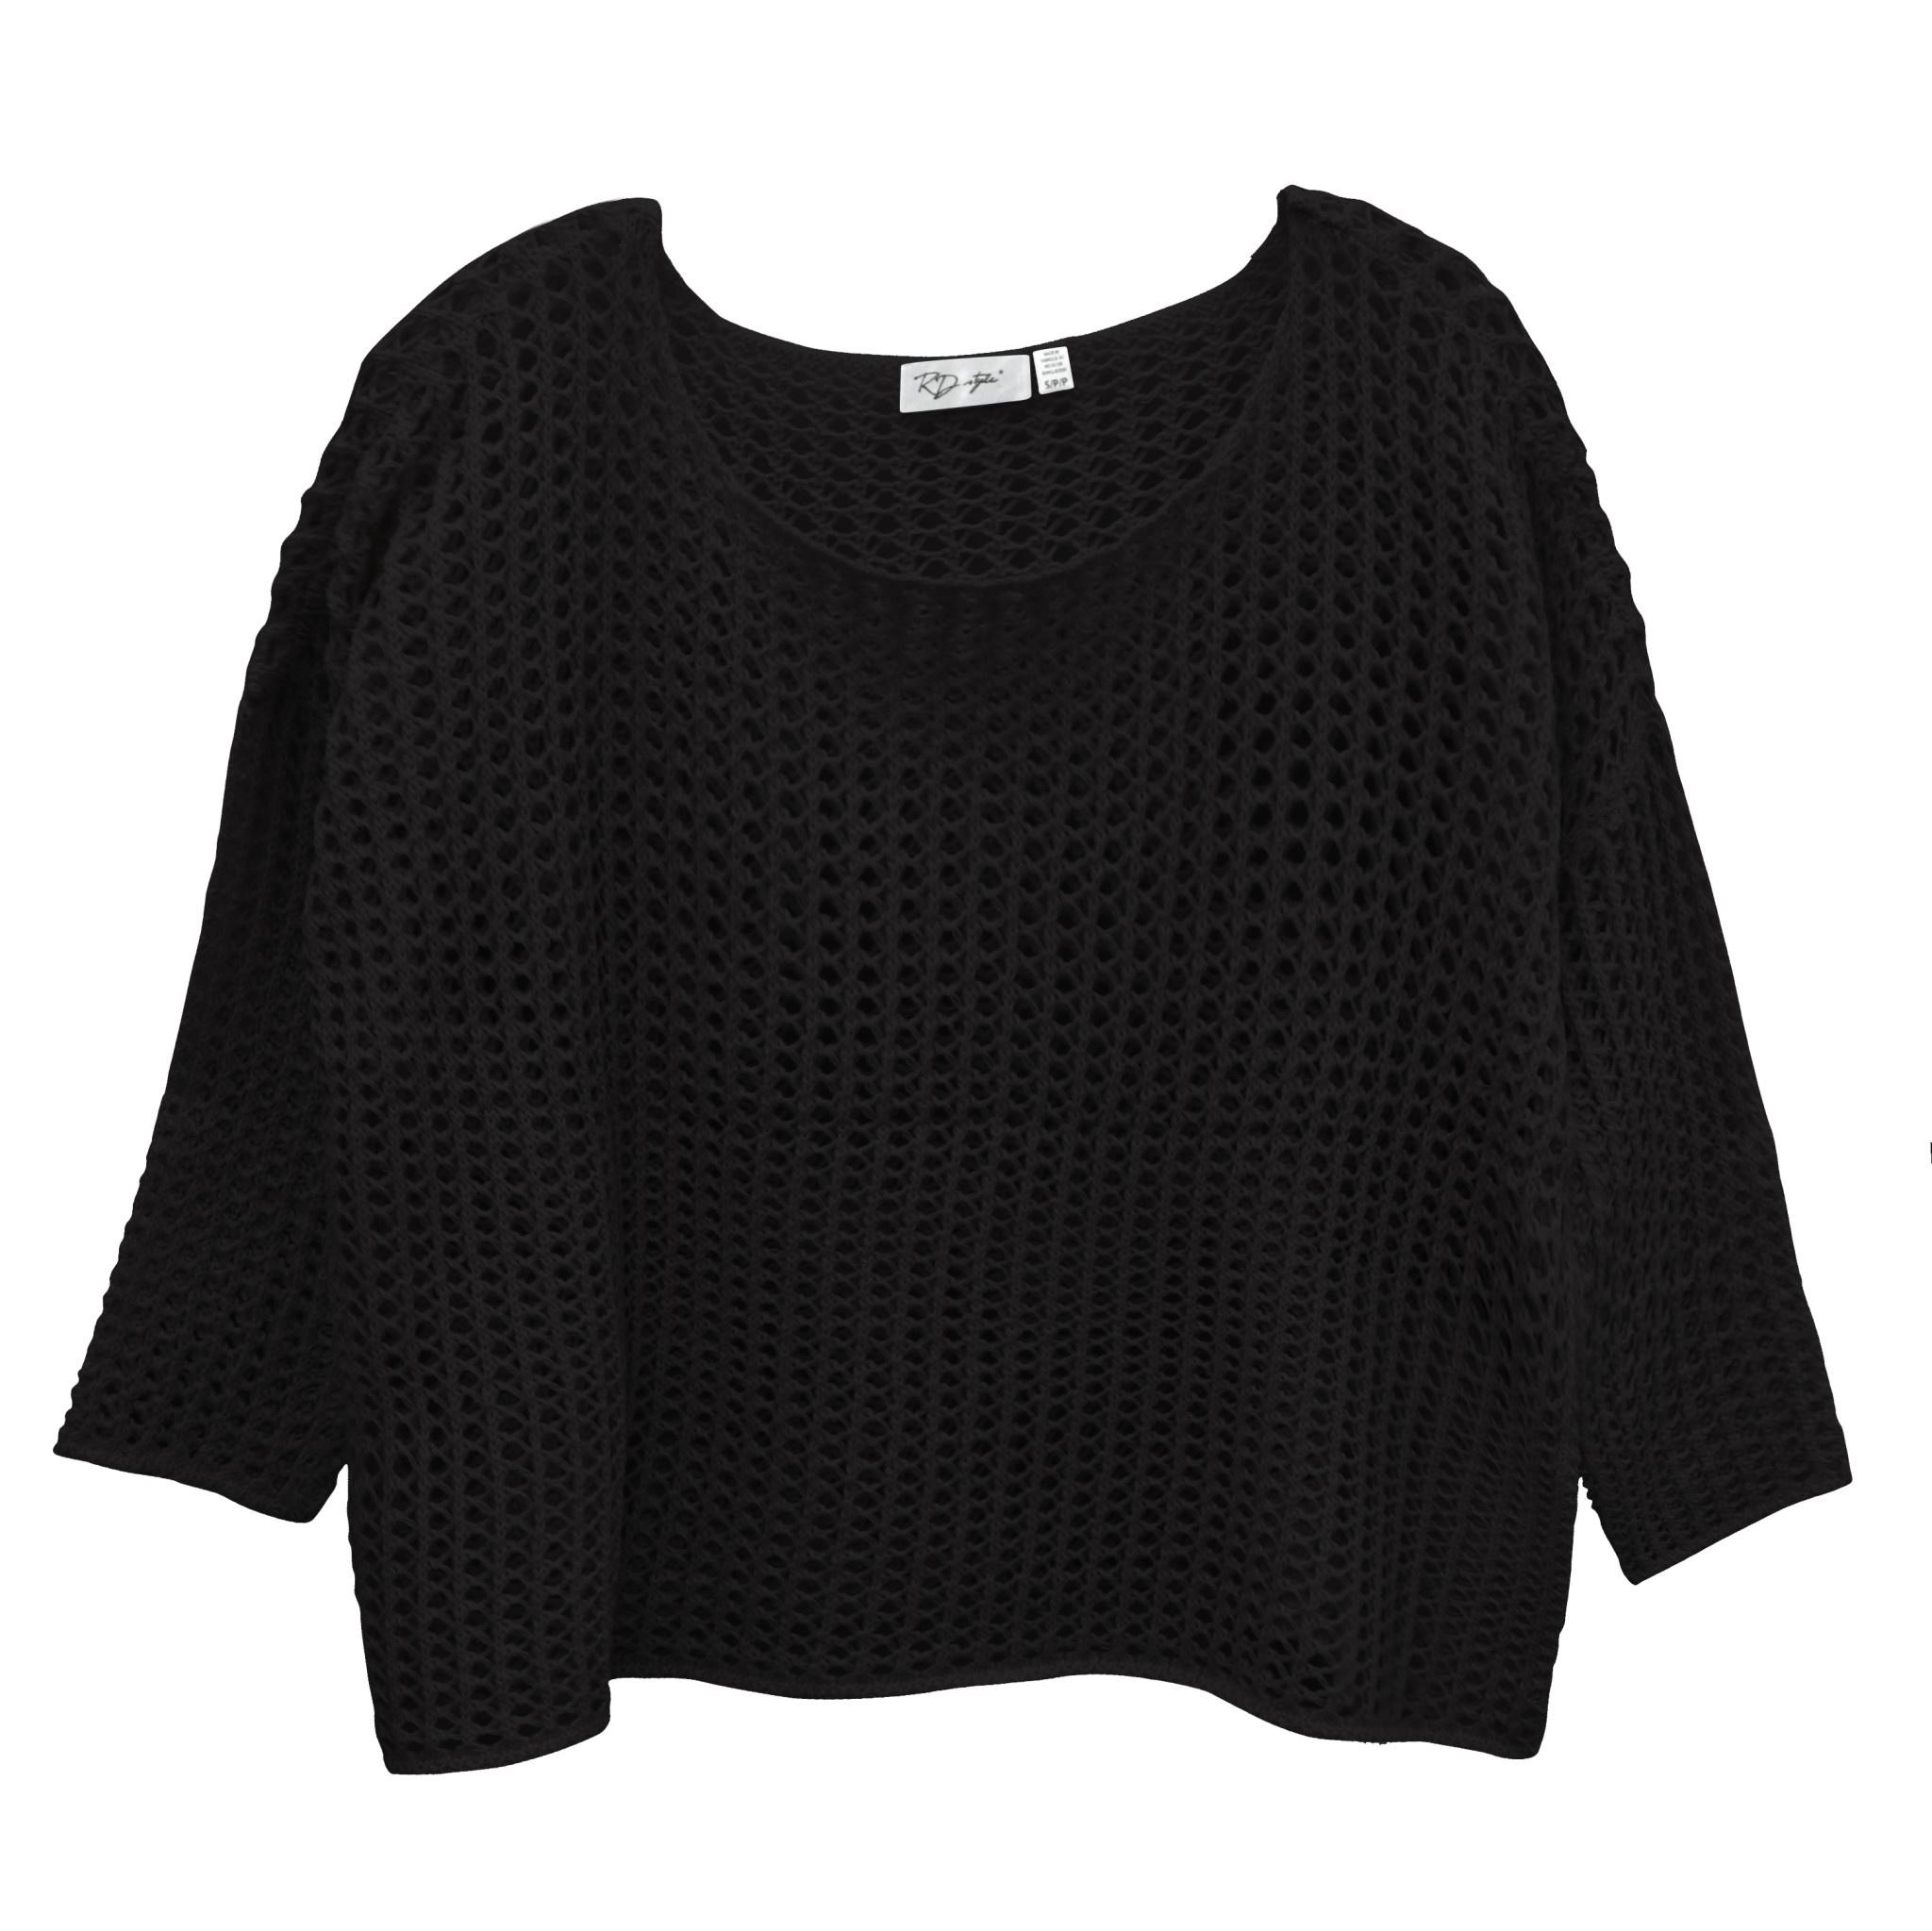 Fishnet Sweater